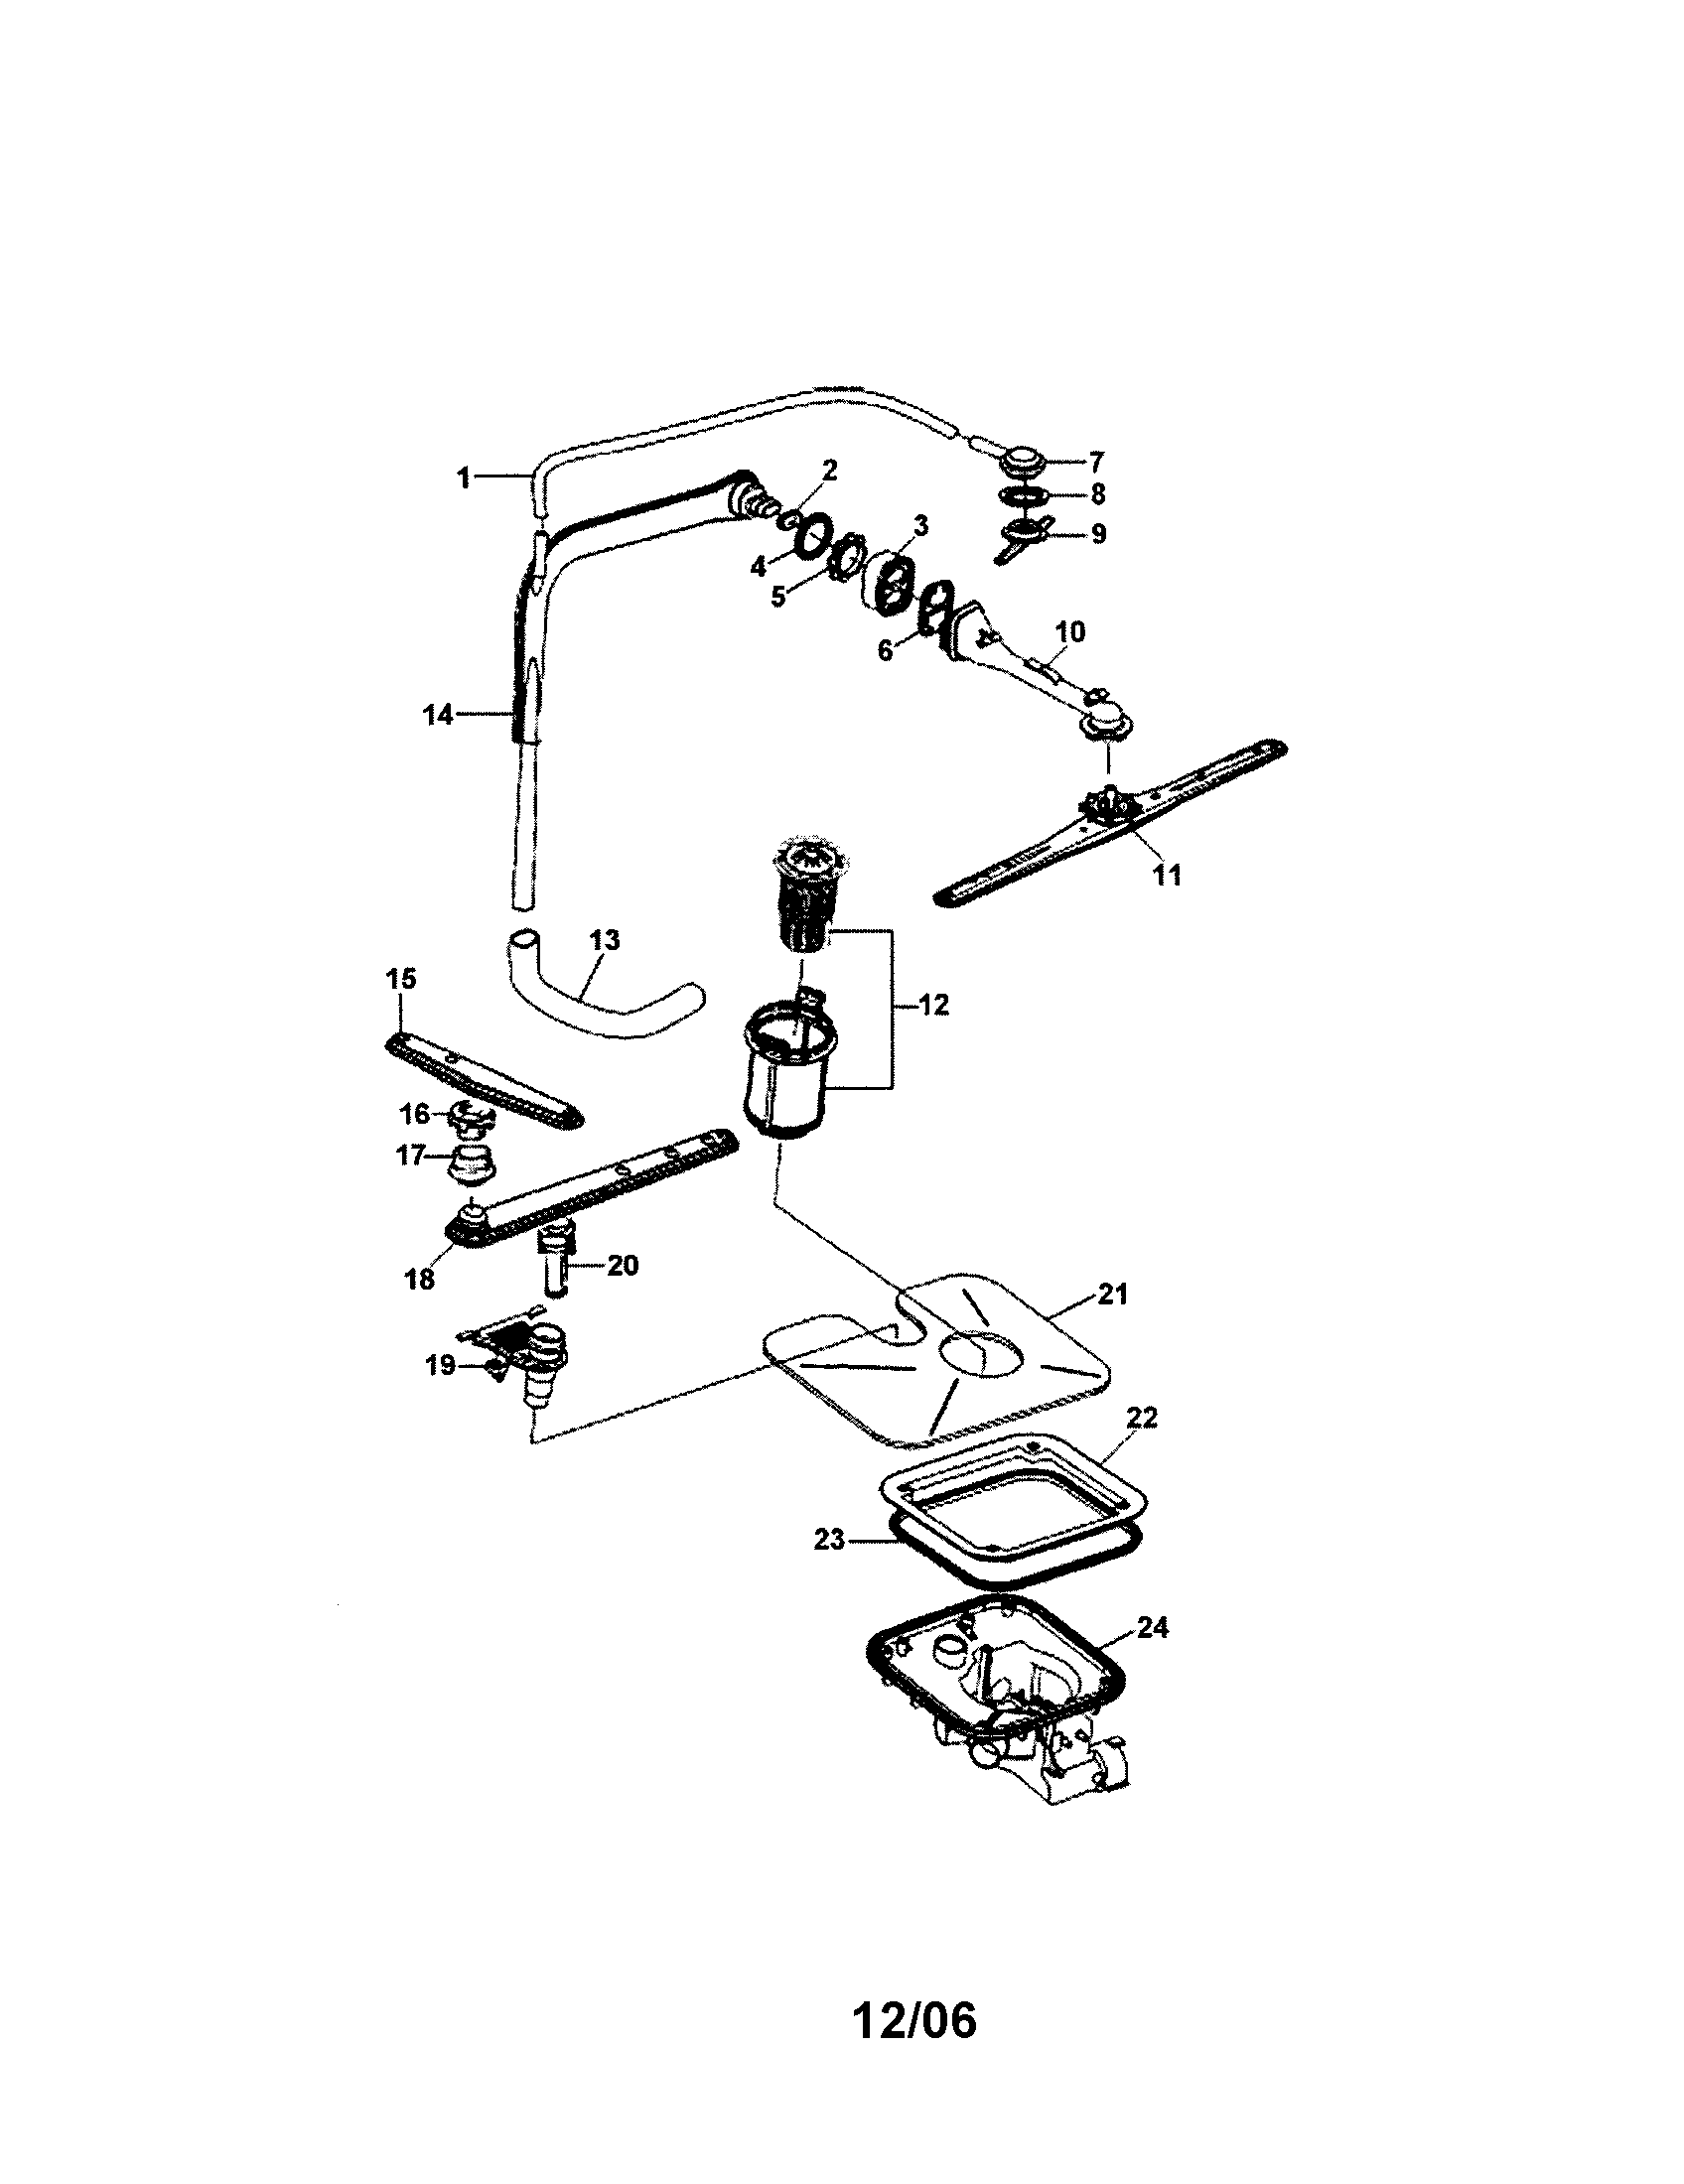 ab micrologix 1400 wiring diagram loncin quad bike 1200 30 images